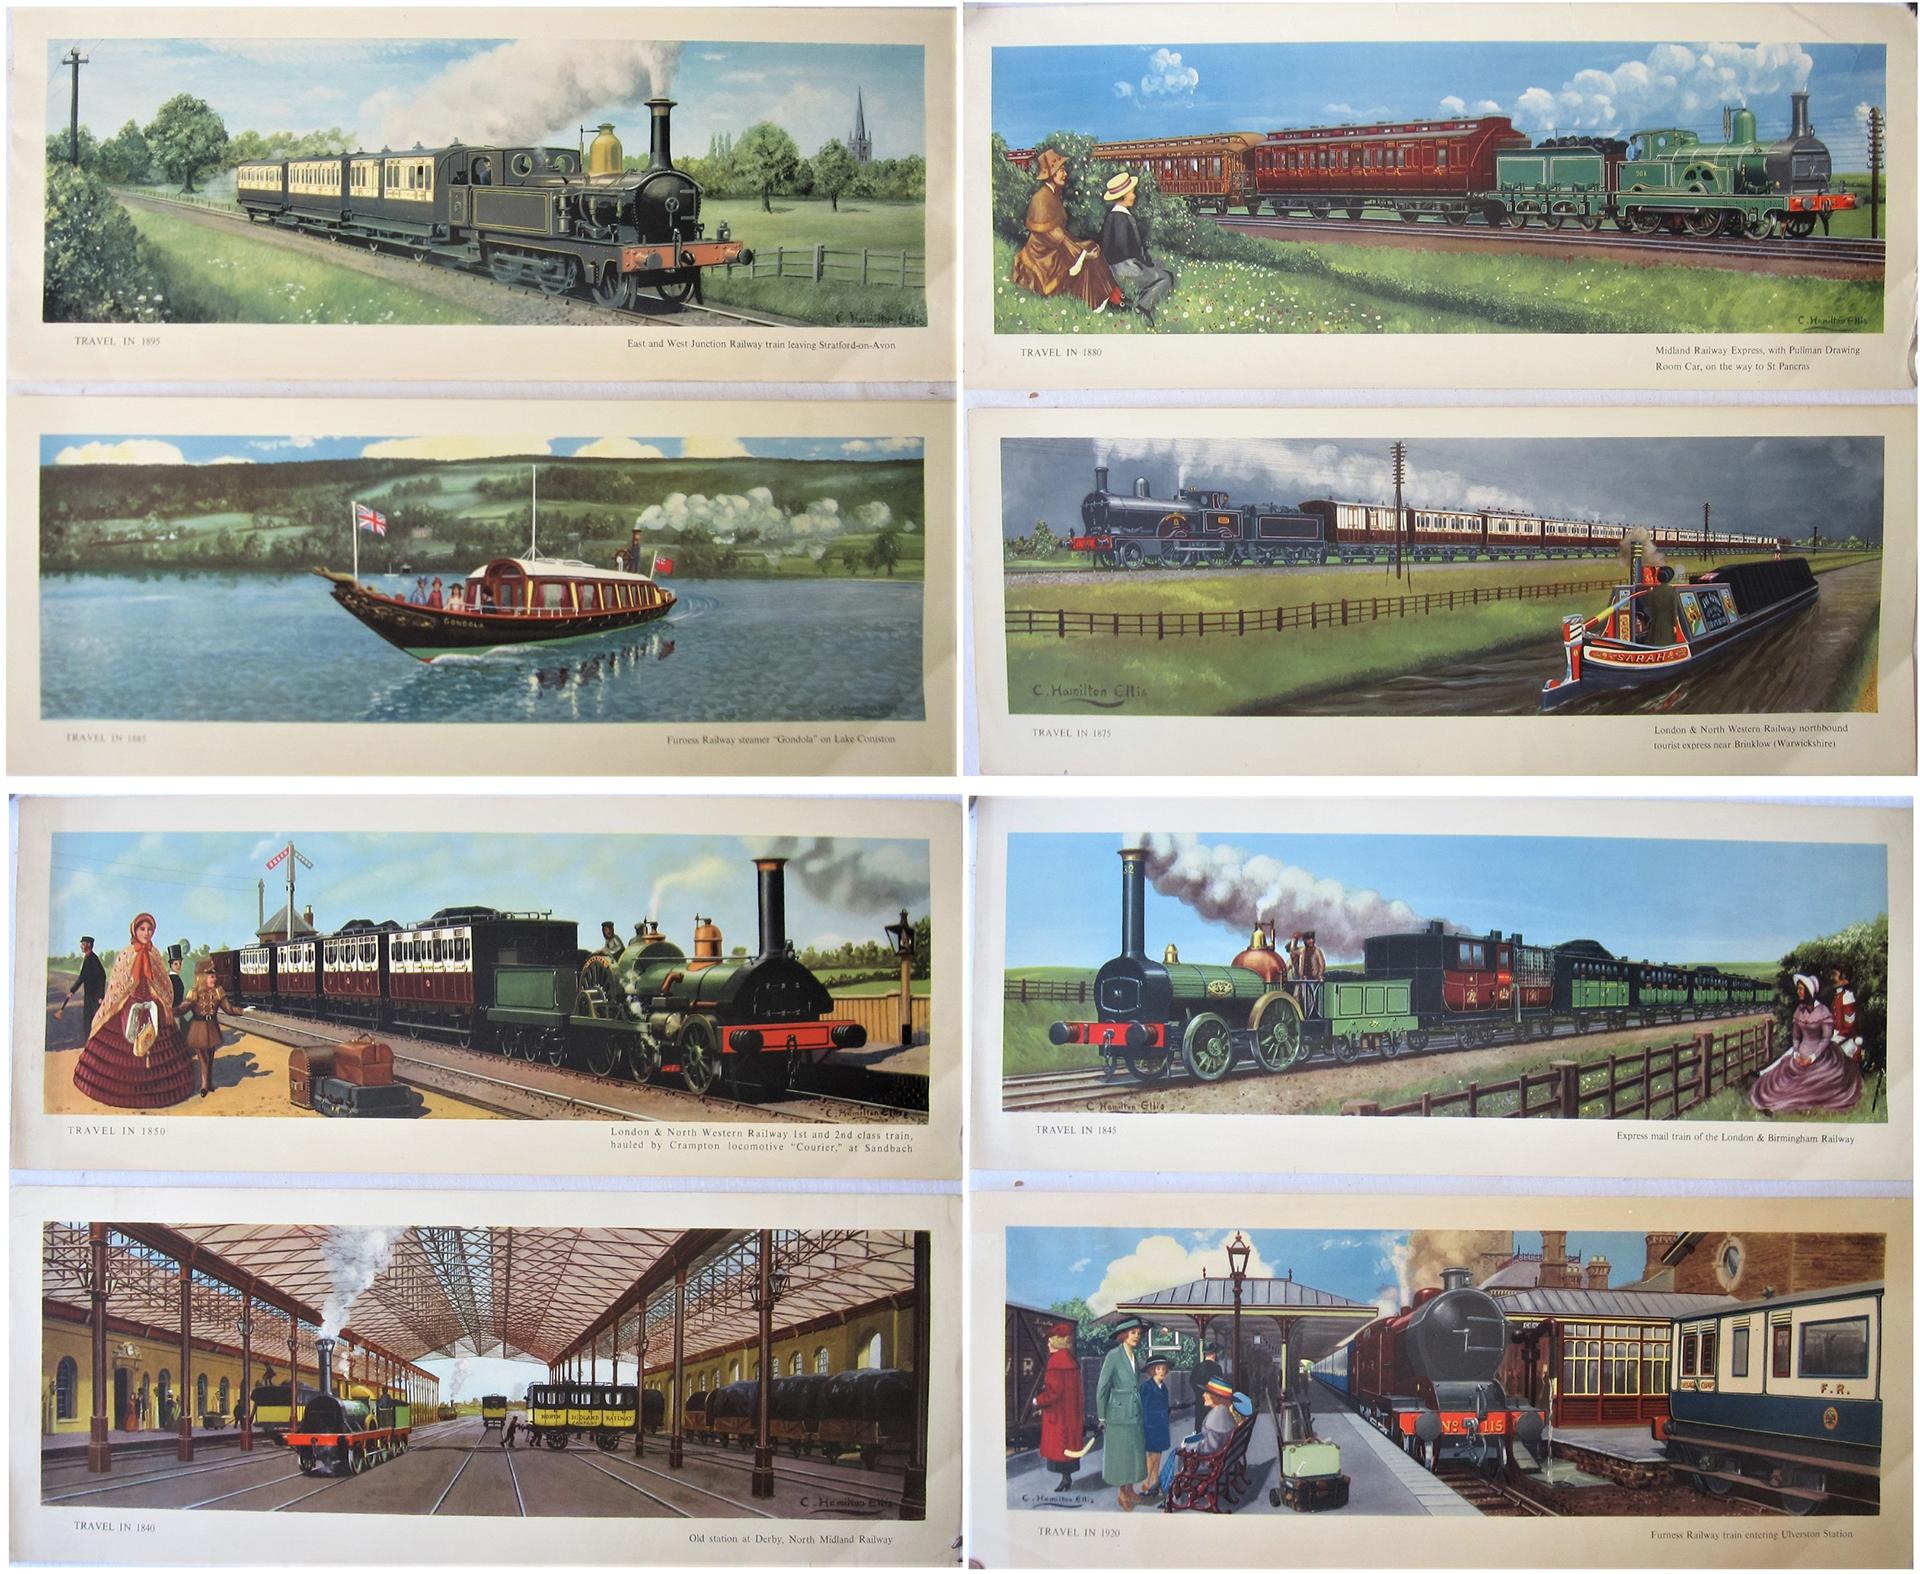 8 x unframed BR(M) Hamilton Ellis carriage prints. TRAVEL IN 1895, 1885, 1880, 1875, 1840, 1850,